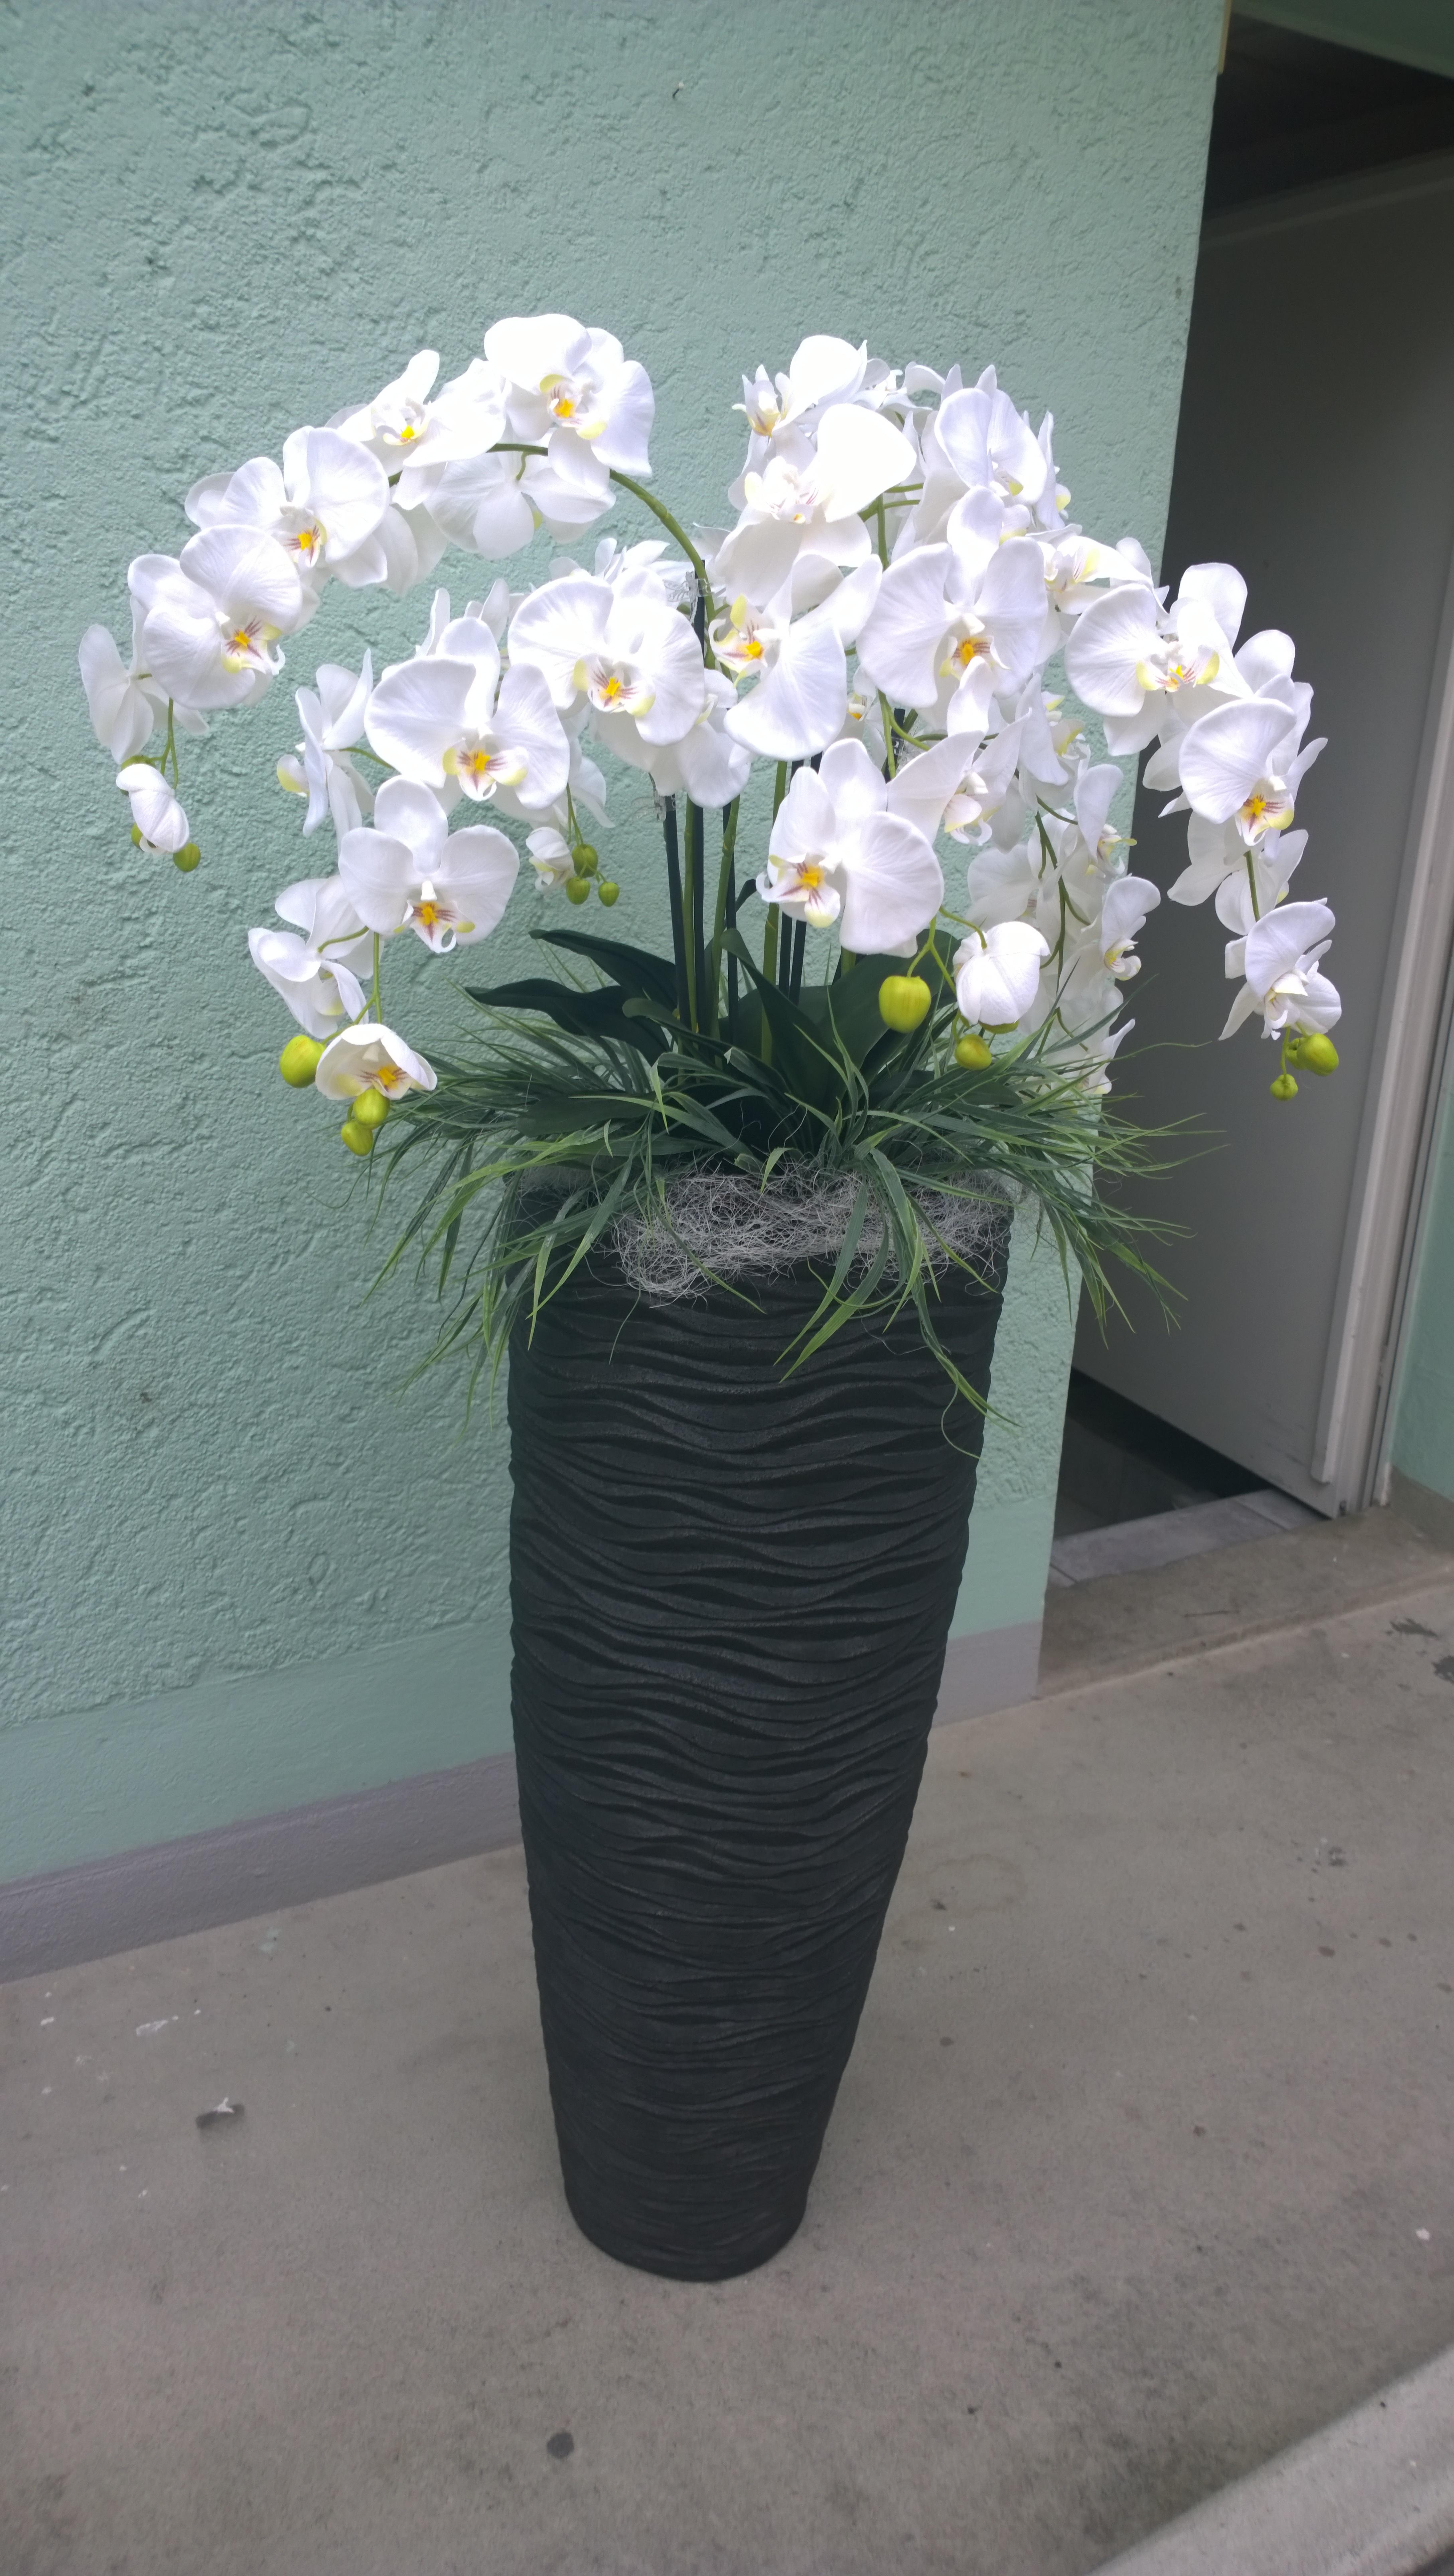 Galerie orchidee wettingen gmbh - Orchideen arrangement ...